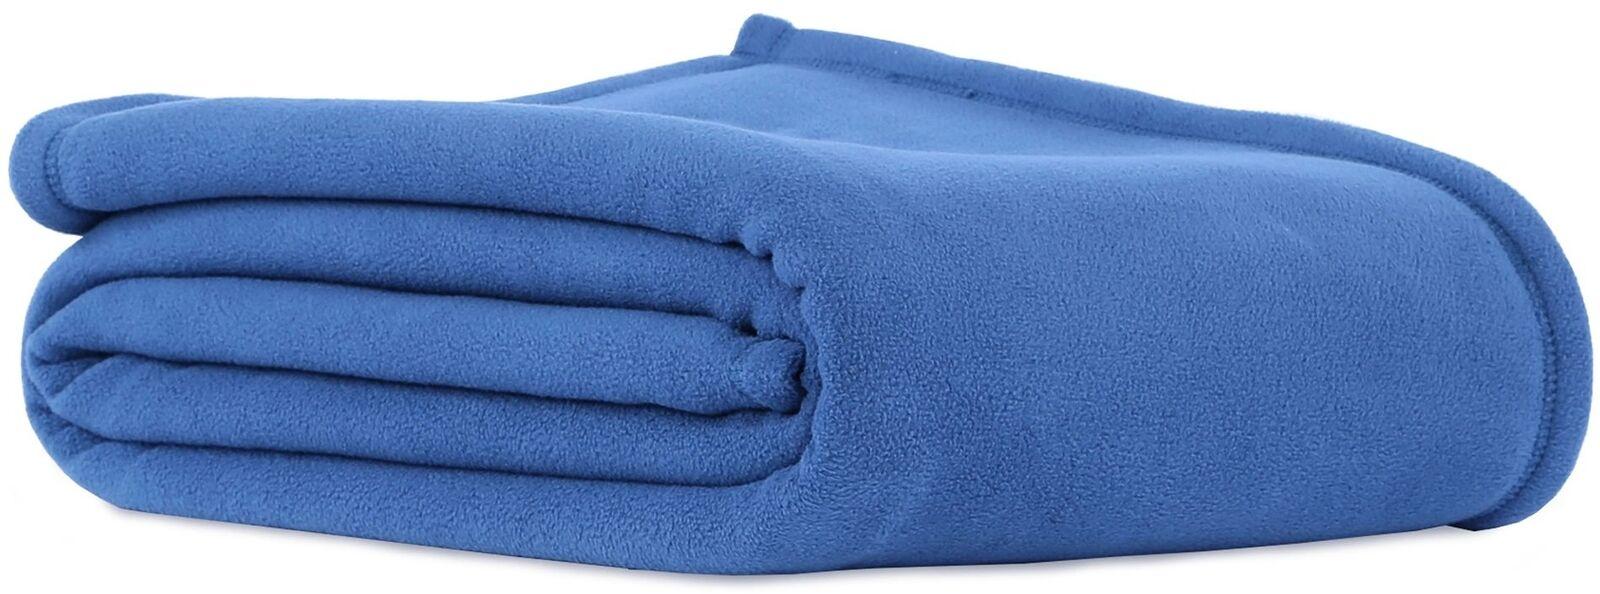 90-in Home Bed Sofa Bedding TWIN Polyester Original Microfleece Blanket bluee